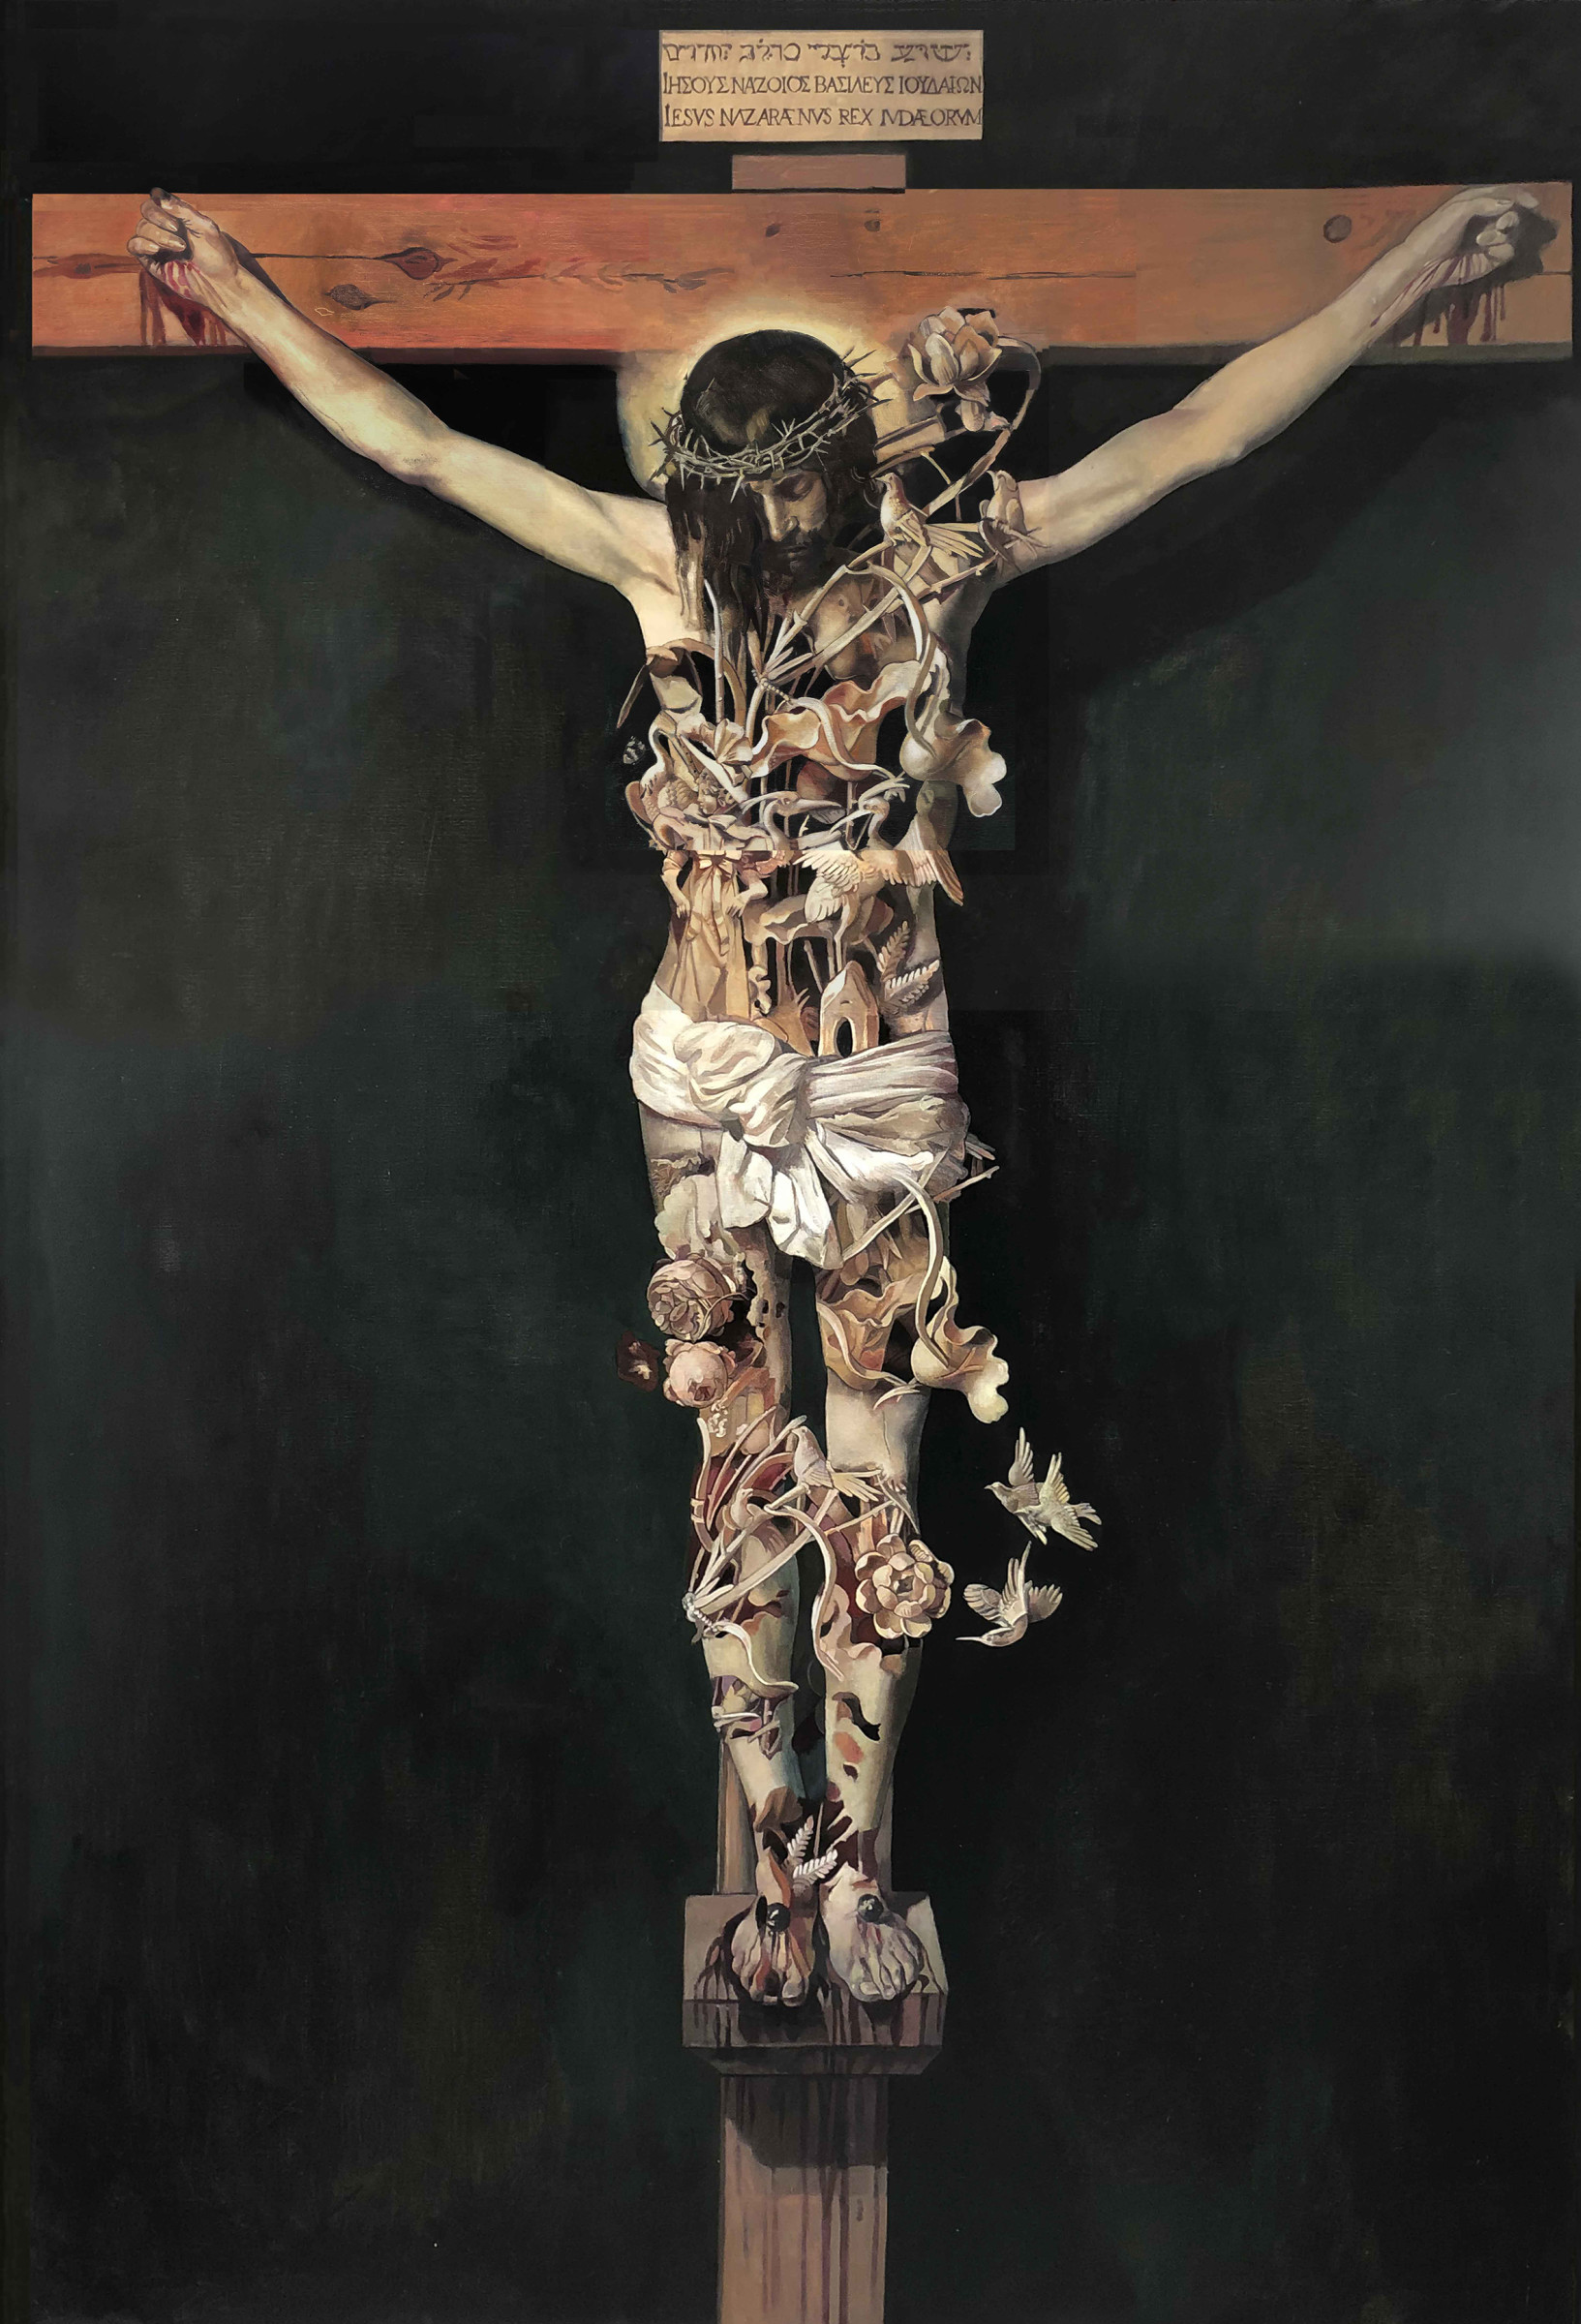 Wolfe von Lenkiewicz, Christ on the Cross, 2018